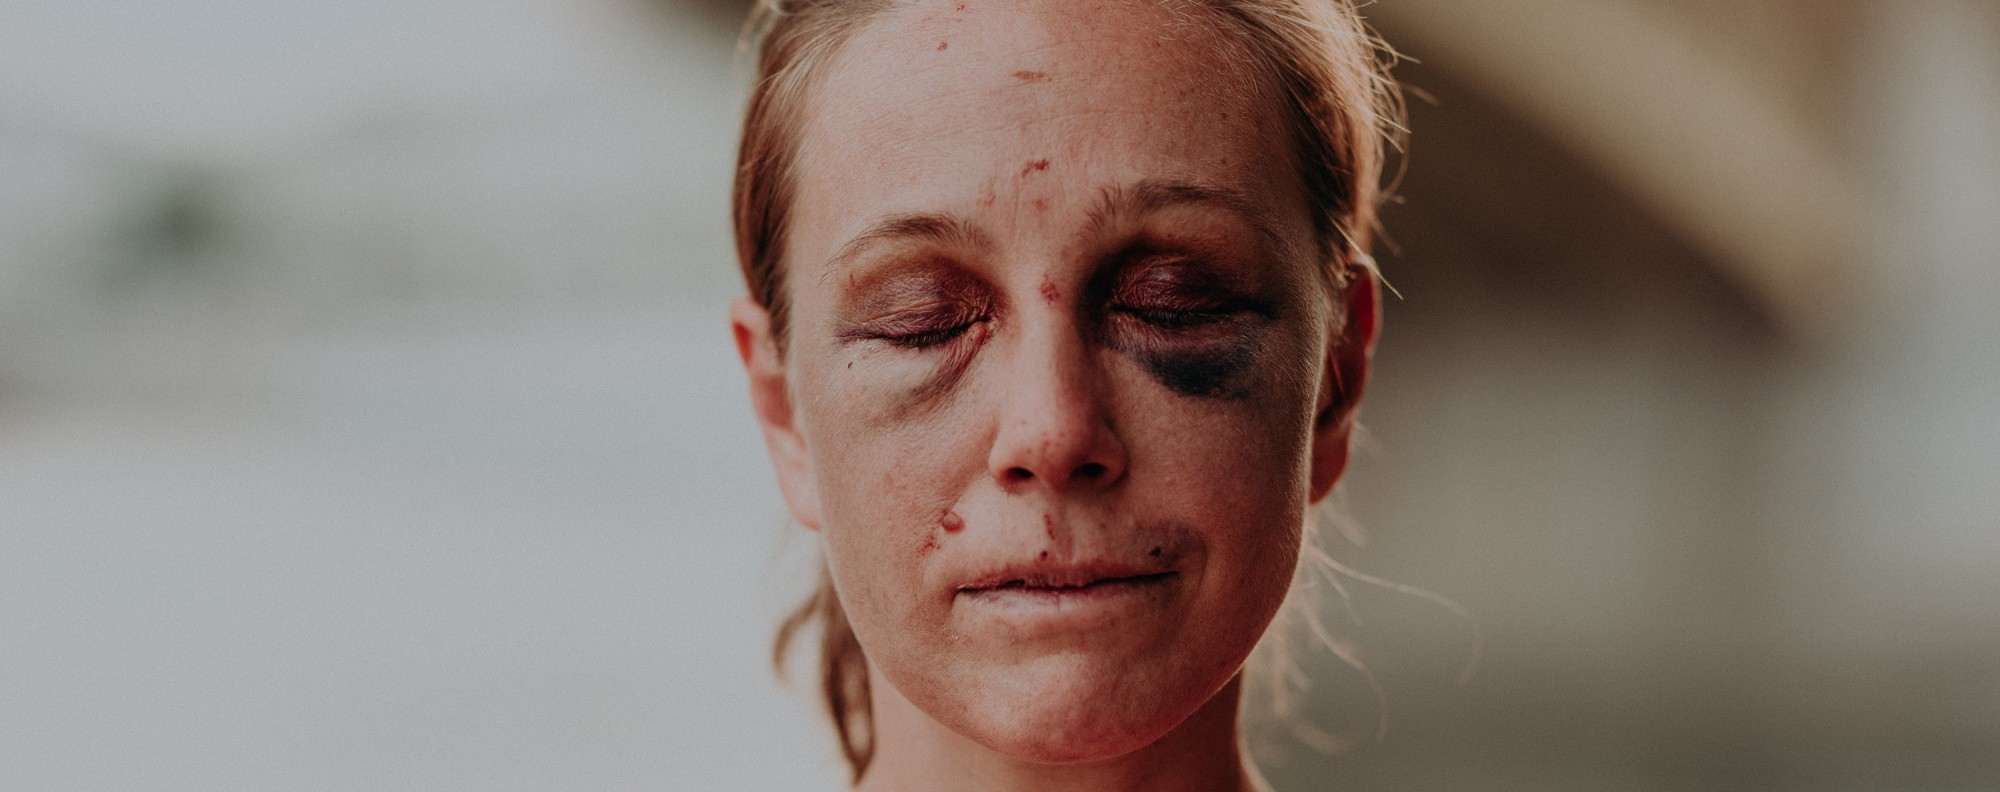 Hungarian ultramarathoner Viktória Makai shows her injuries after being attacked while out running. Photos: Sportágválasztó